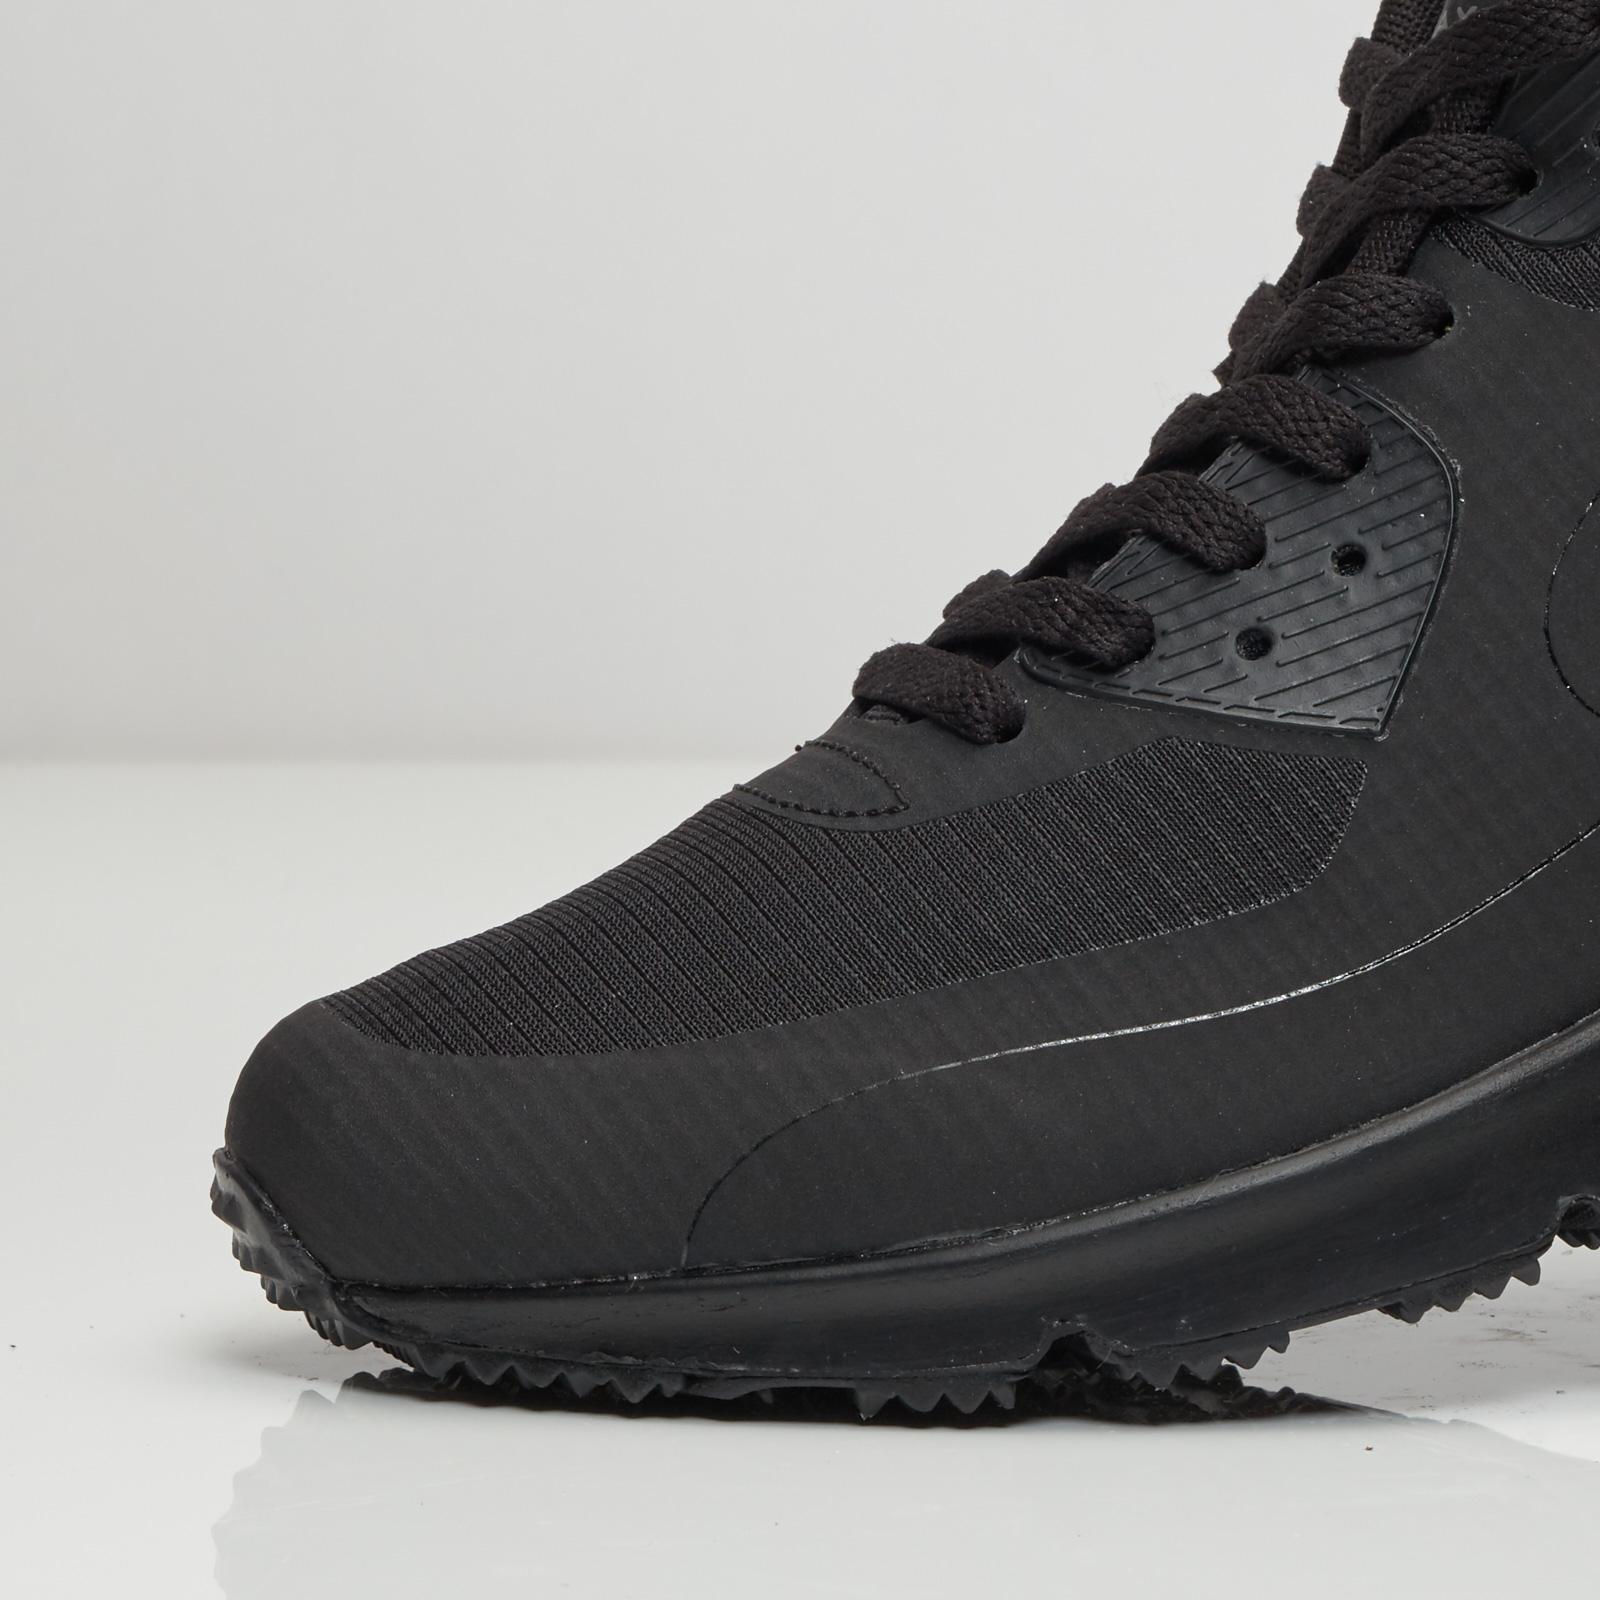 0c265638a2e Nike Air Max 90 Mid Winter - 806808-002 - Sneakersnstuff